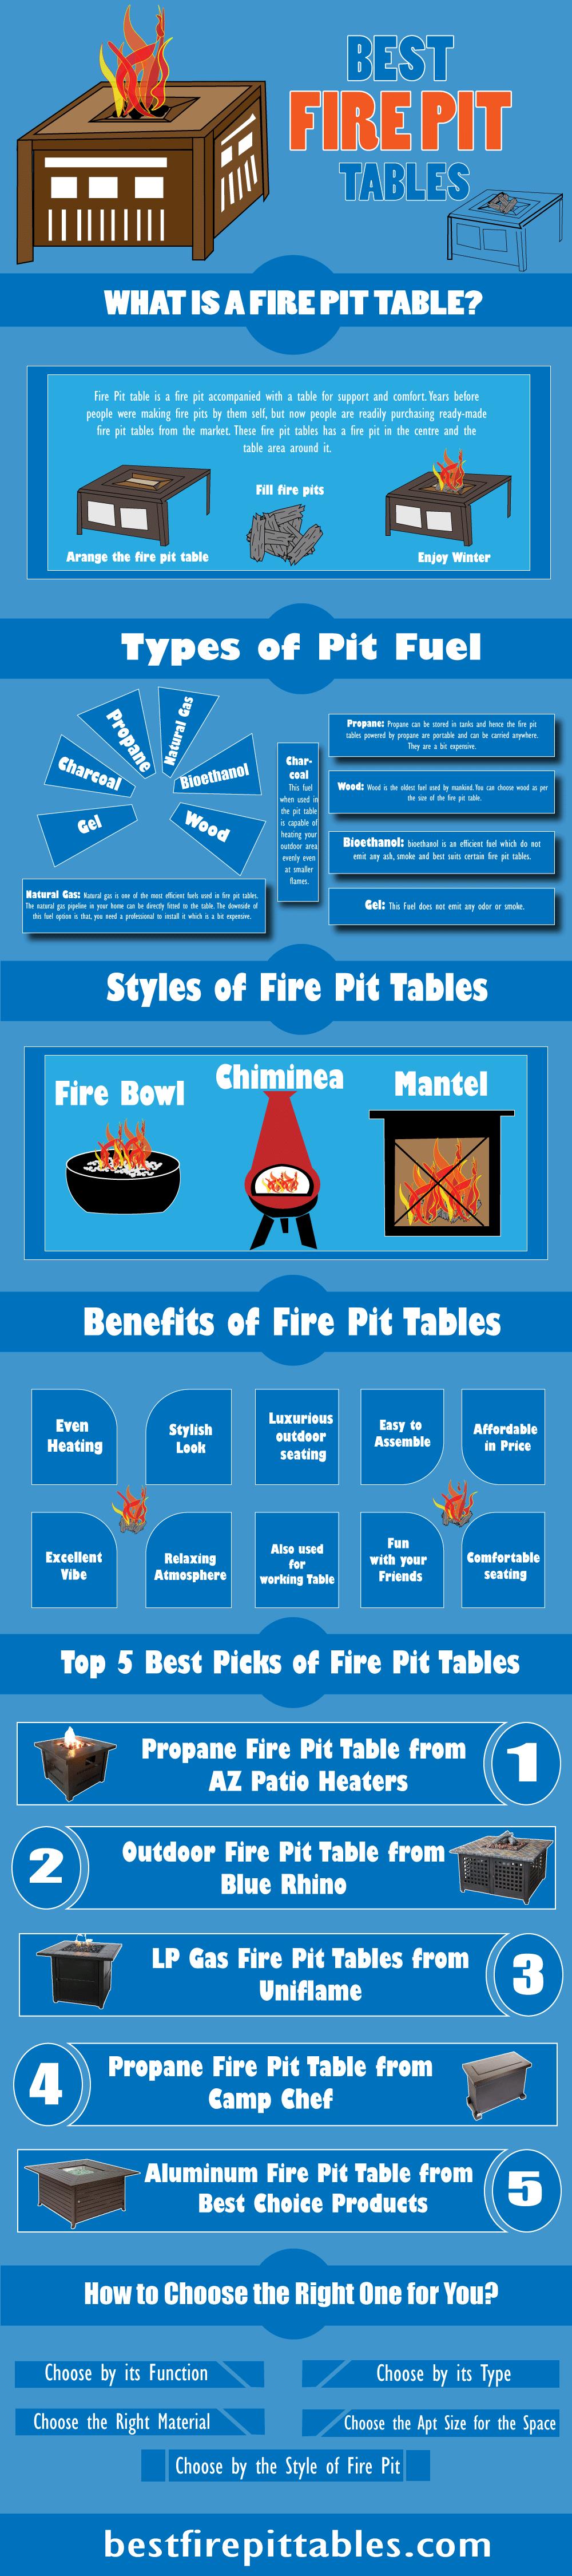 best-fire-pit-tables